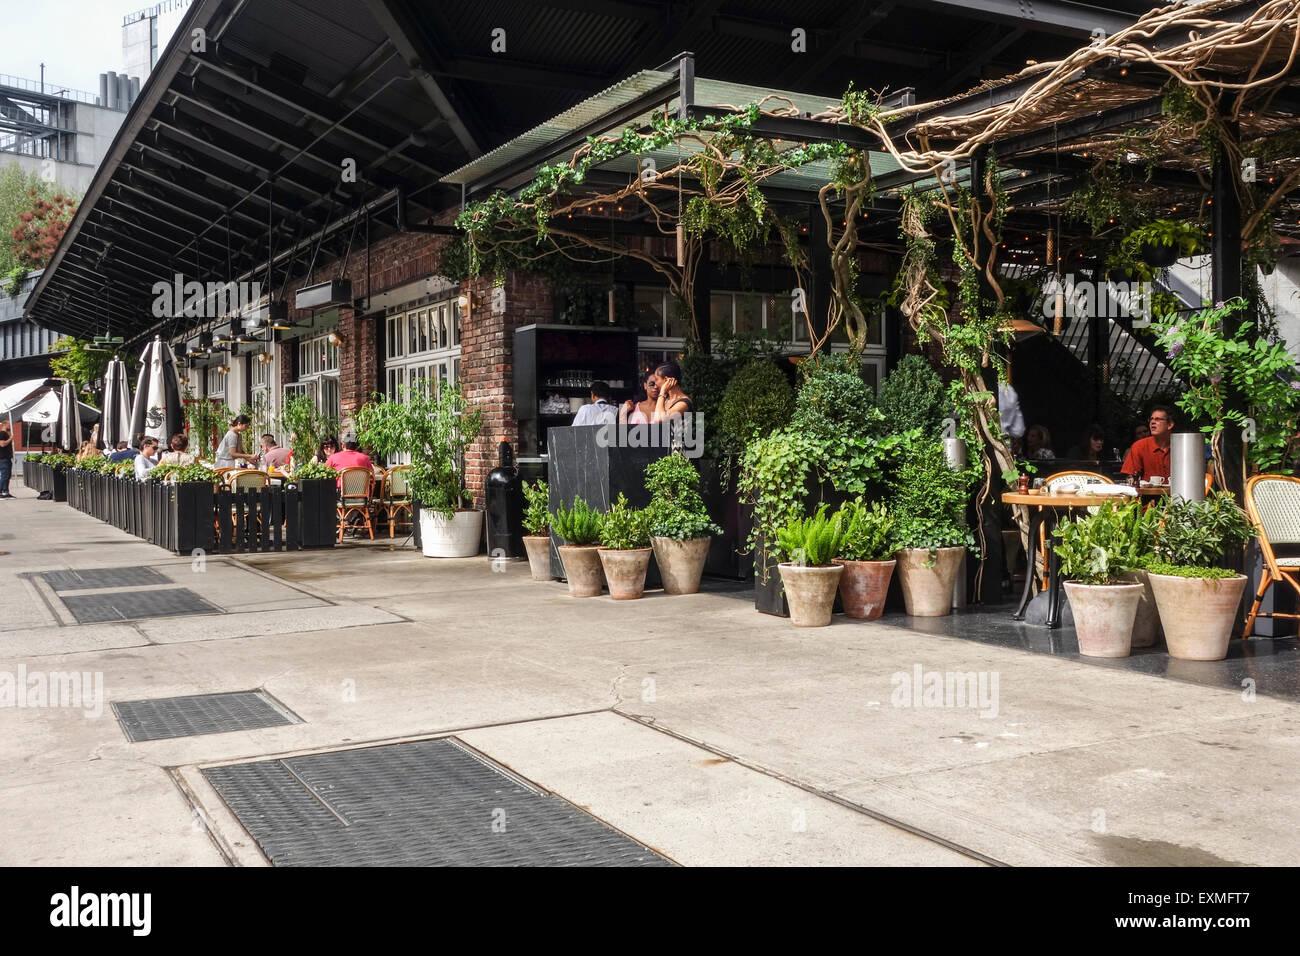 The Standard, grill restaurant, High Line, Boutique Hotel, Manhattan, New York City, USA. Stock Photo